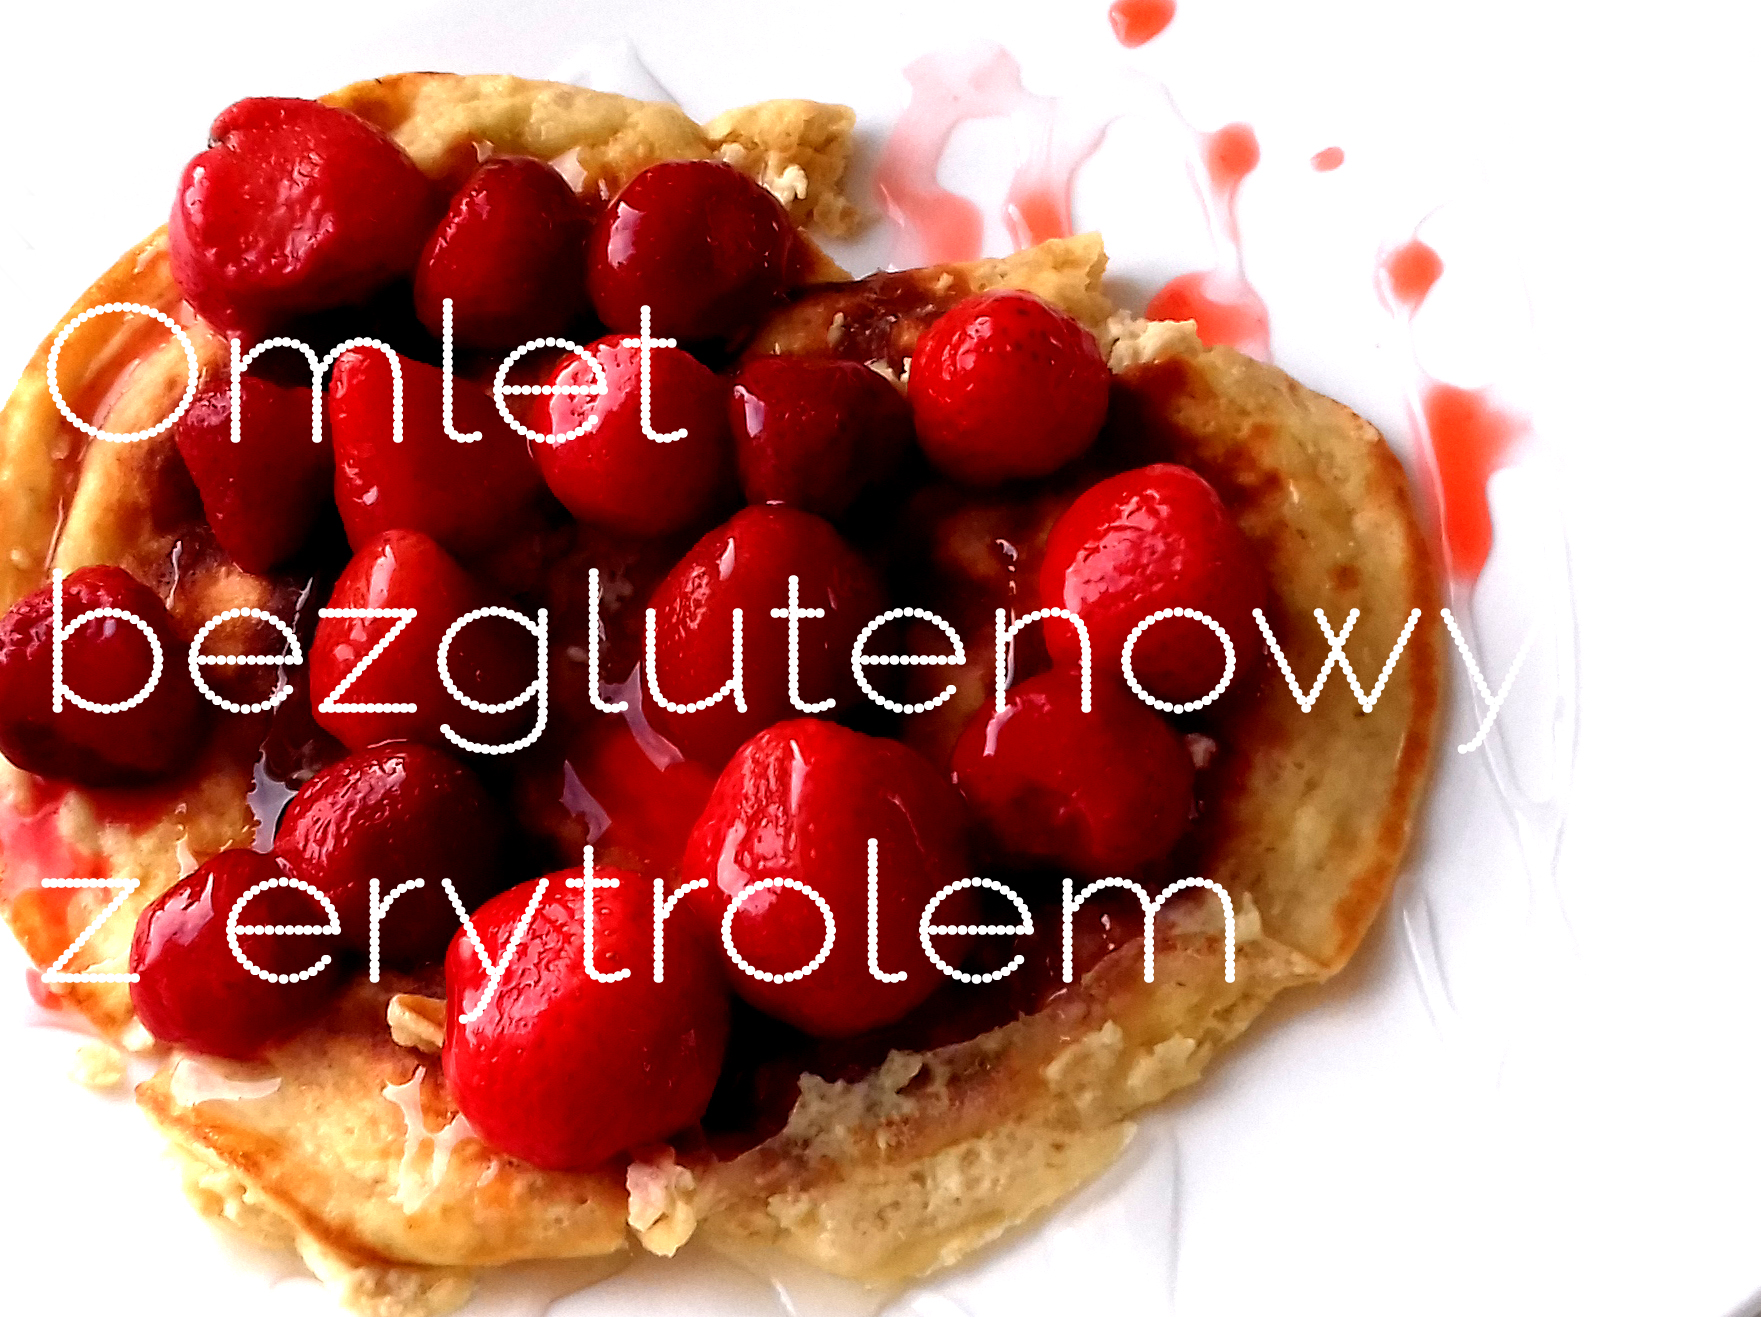 Bezglutenowy omlet owsiany z erytrolem